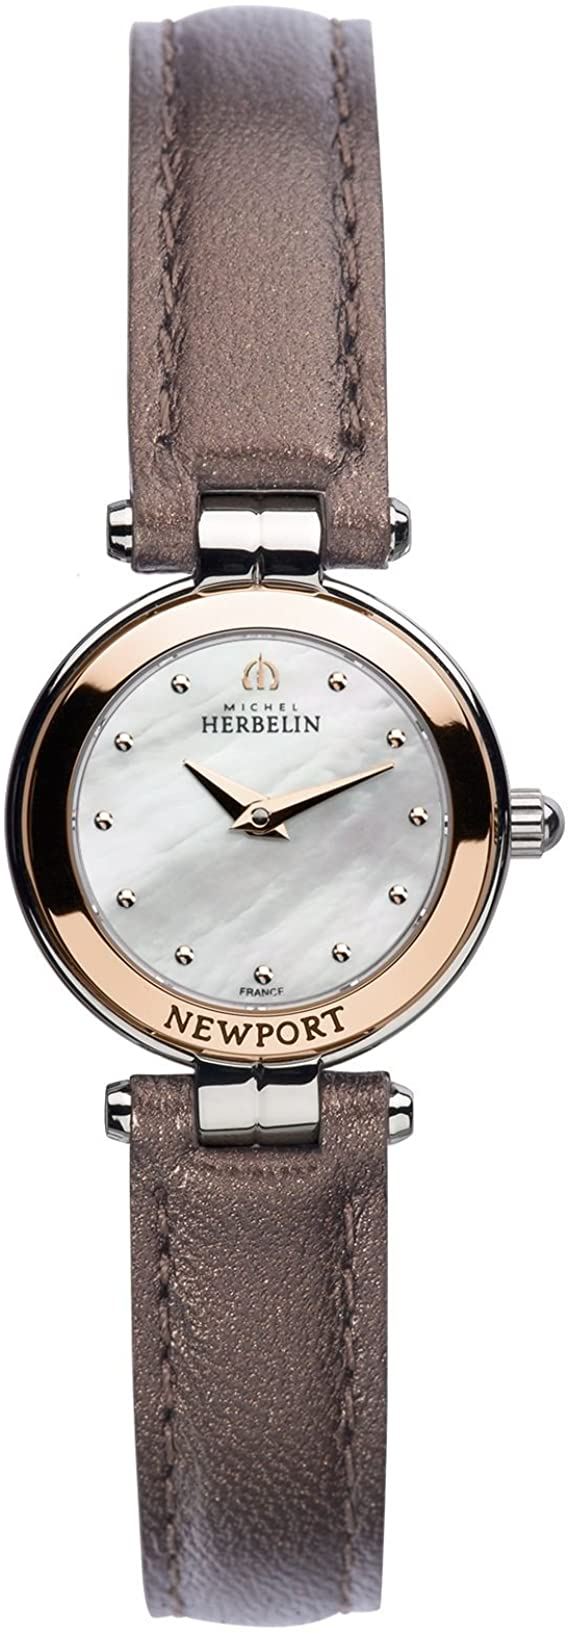 Michel Herbelin Newport Damenarmbanduhr